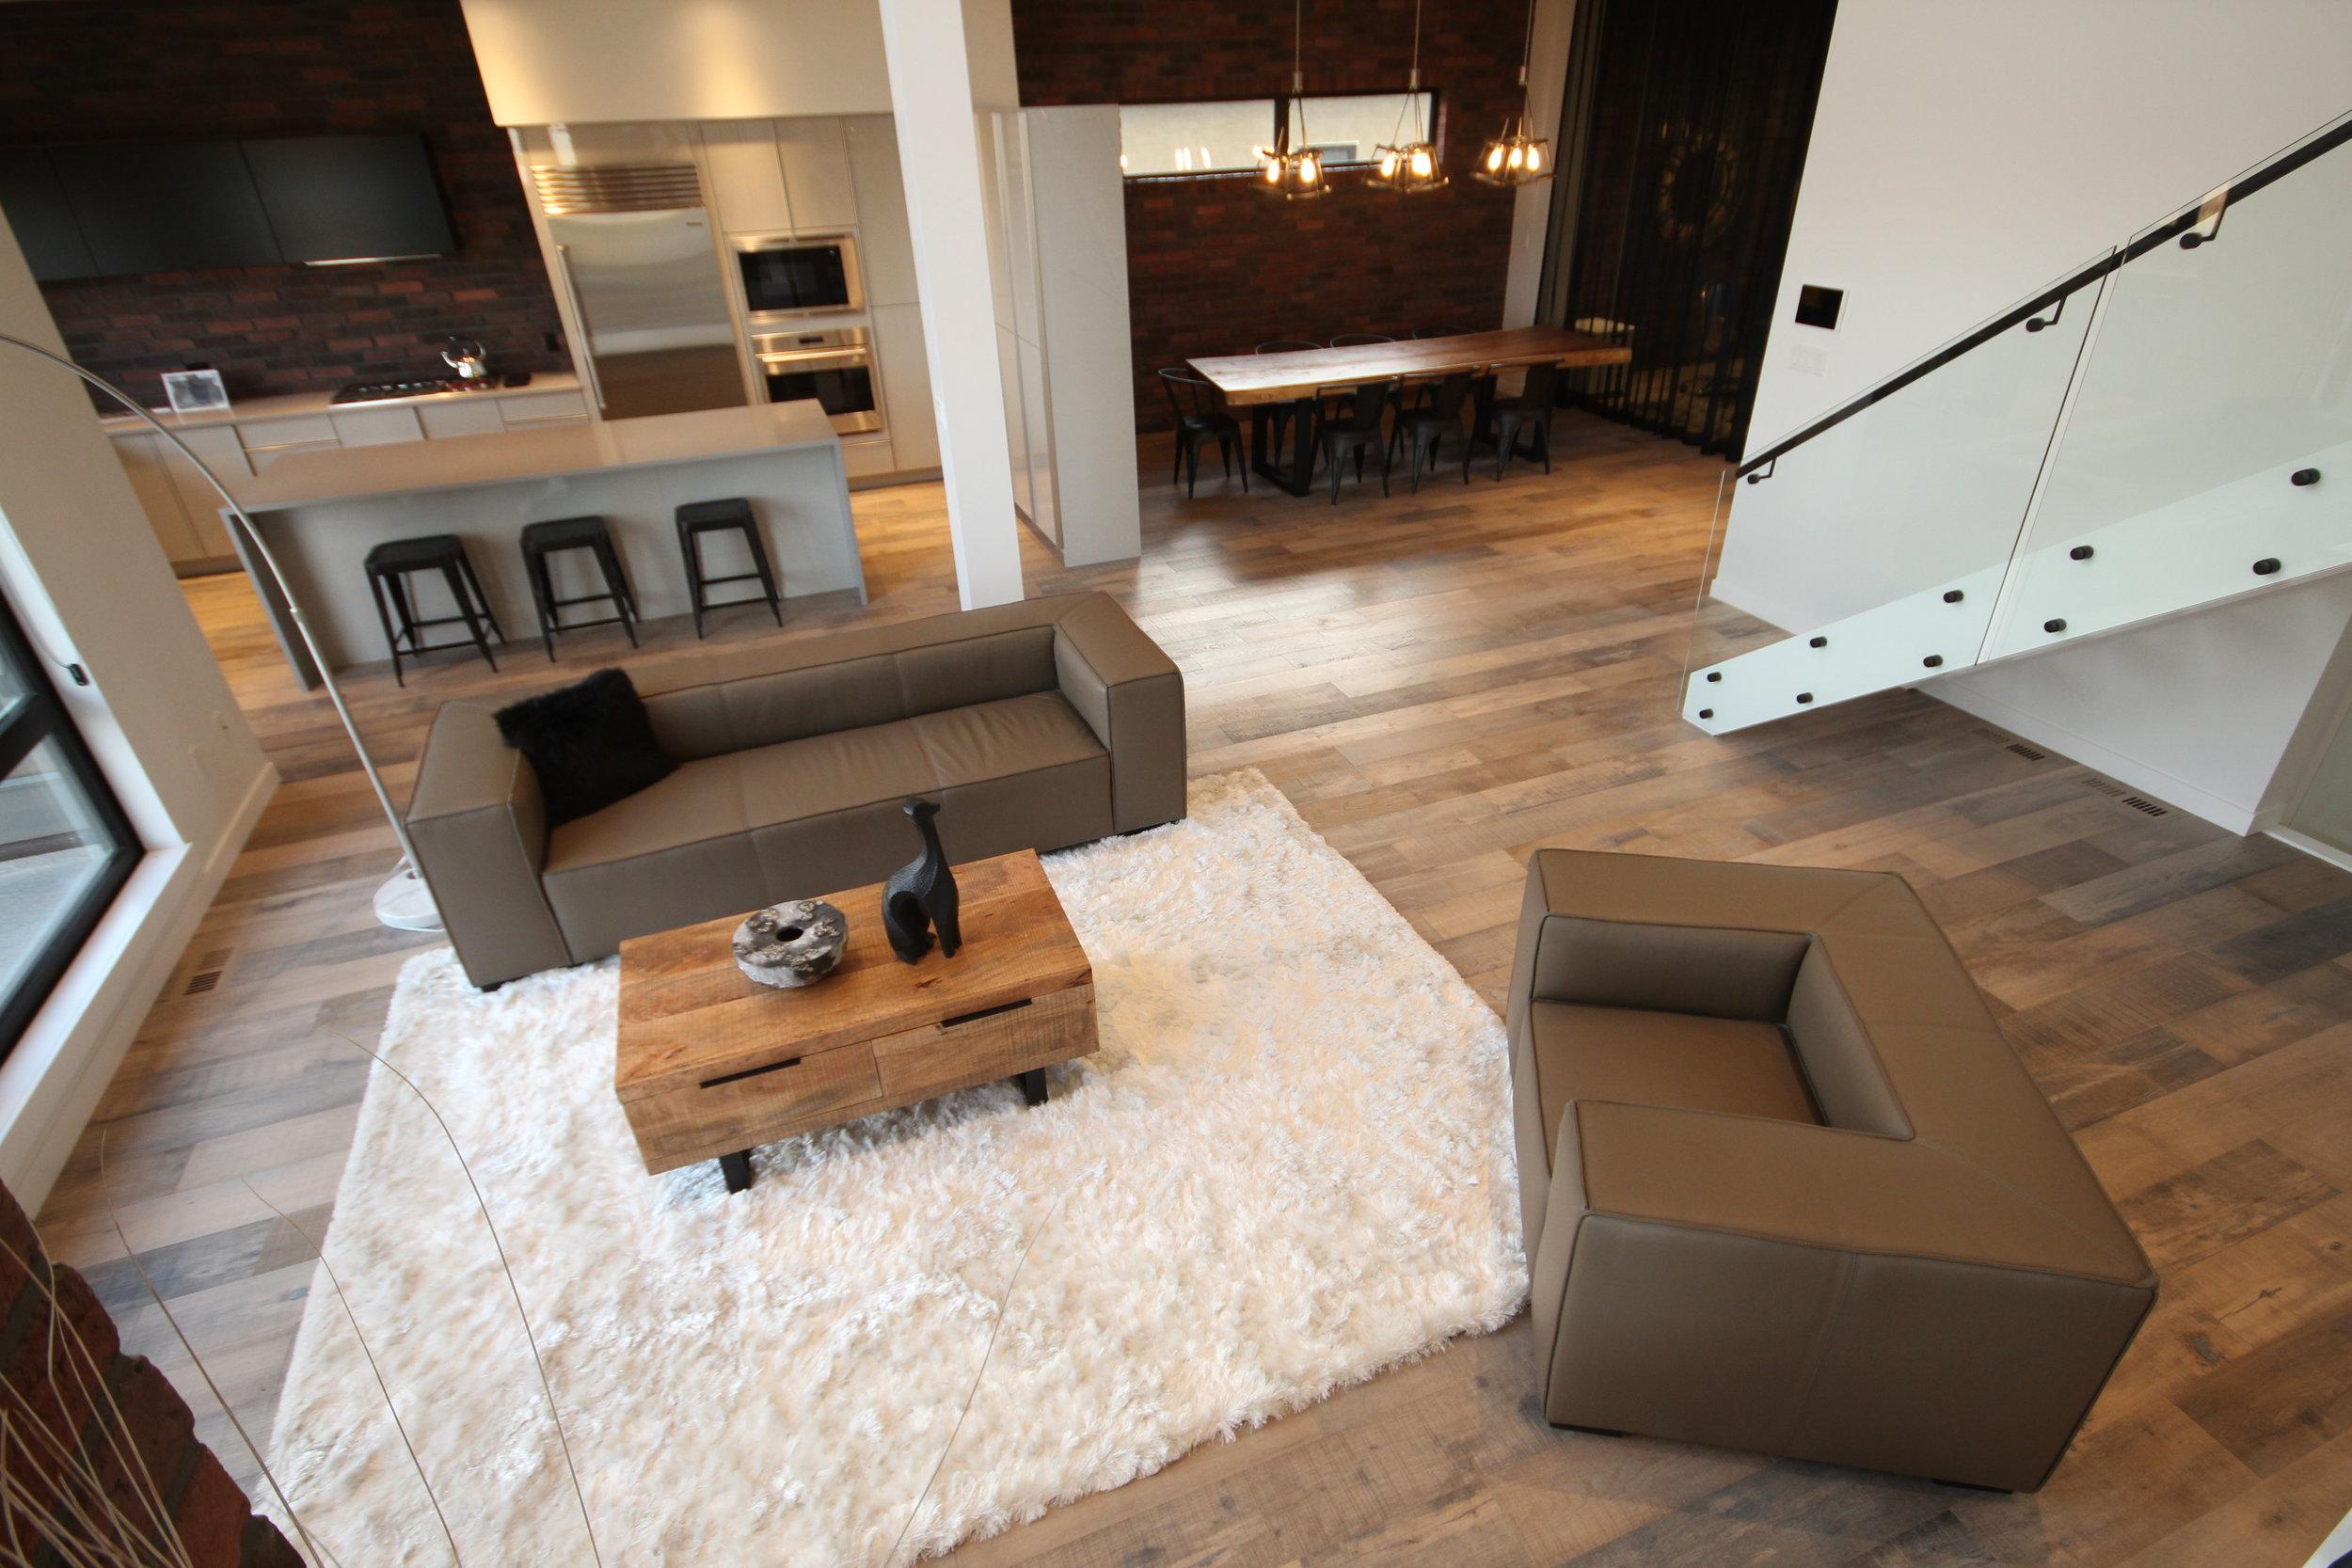 Beau Monde Leather Sofa and chair, artista show home. Blue Moon Furniture. Luxury furniture winnipeg.JPG